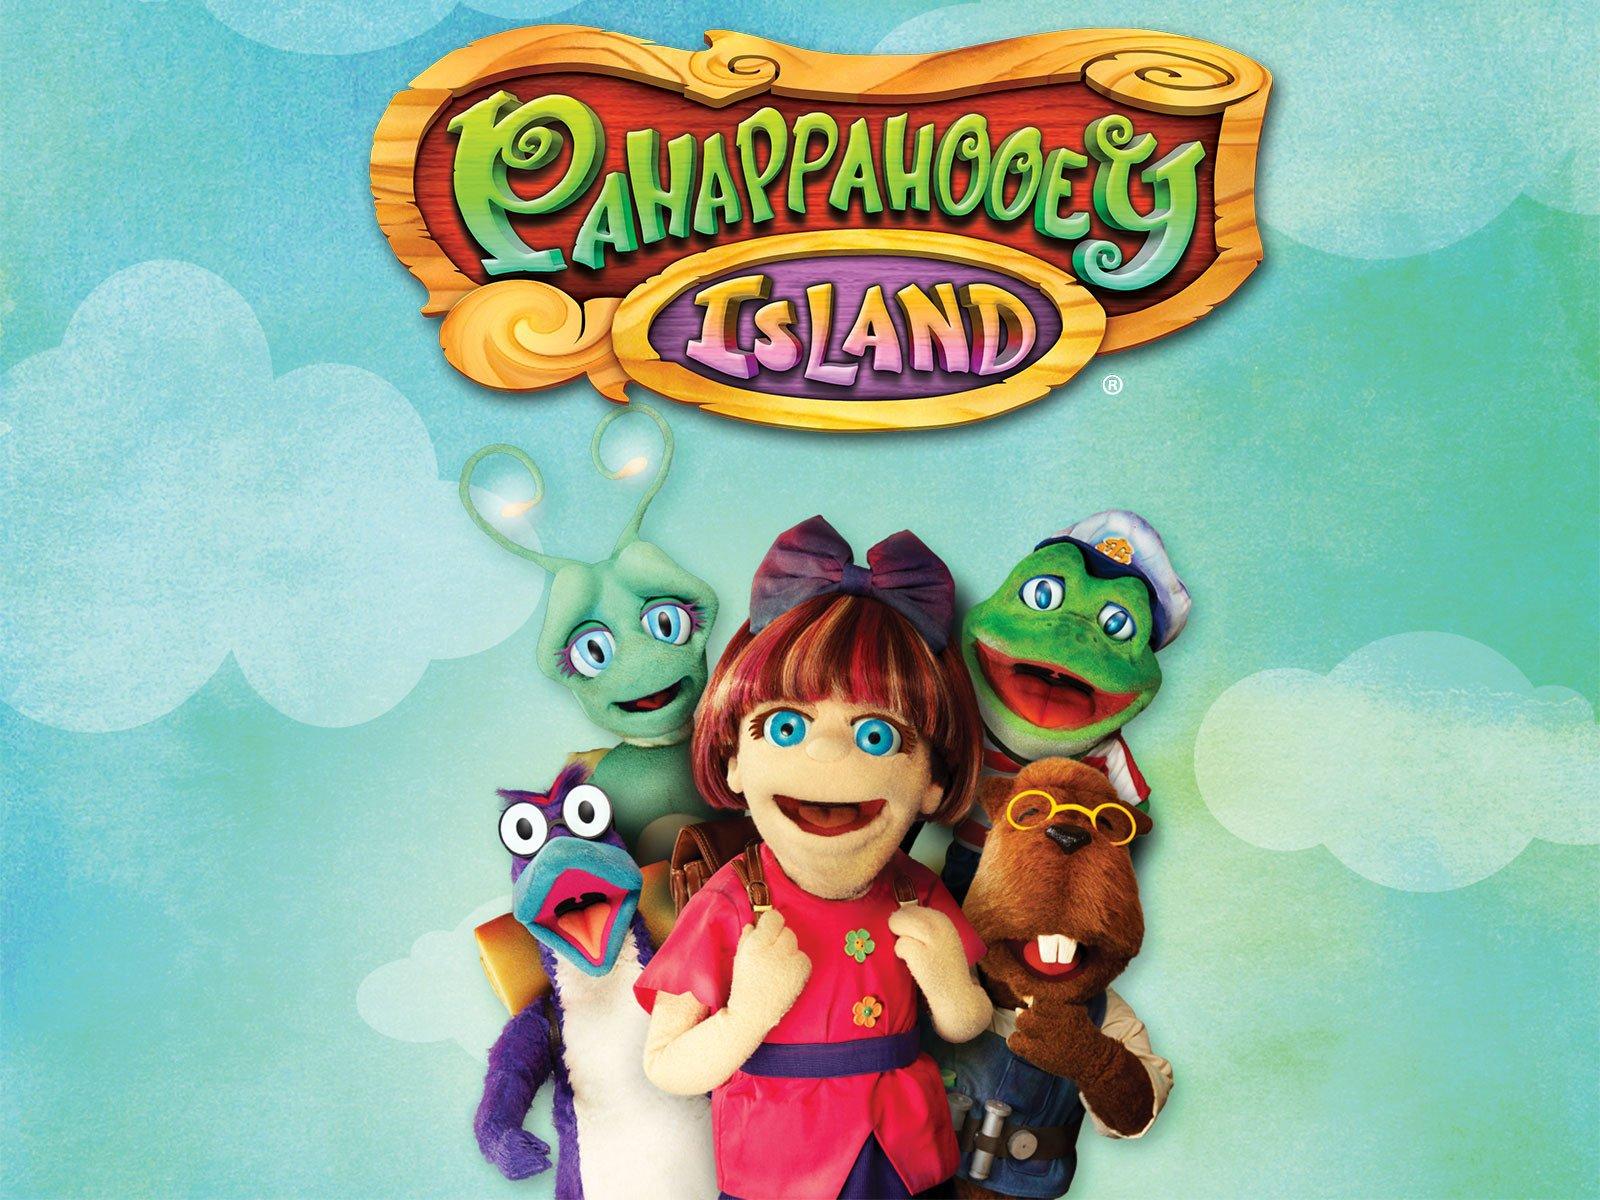 Pahappahooey Island - Season 1